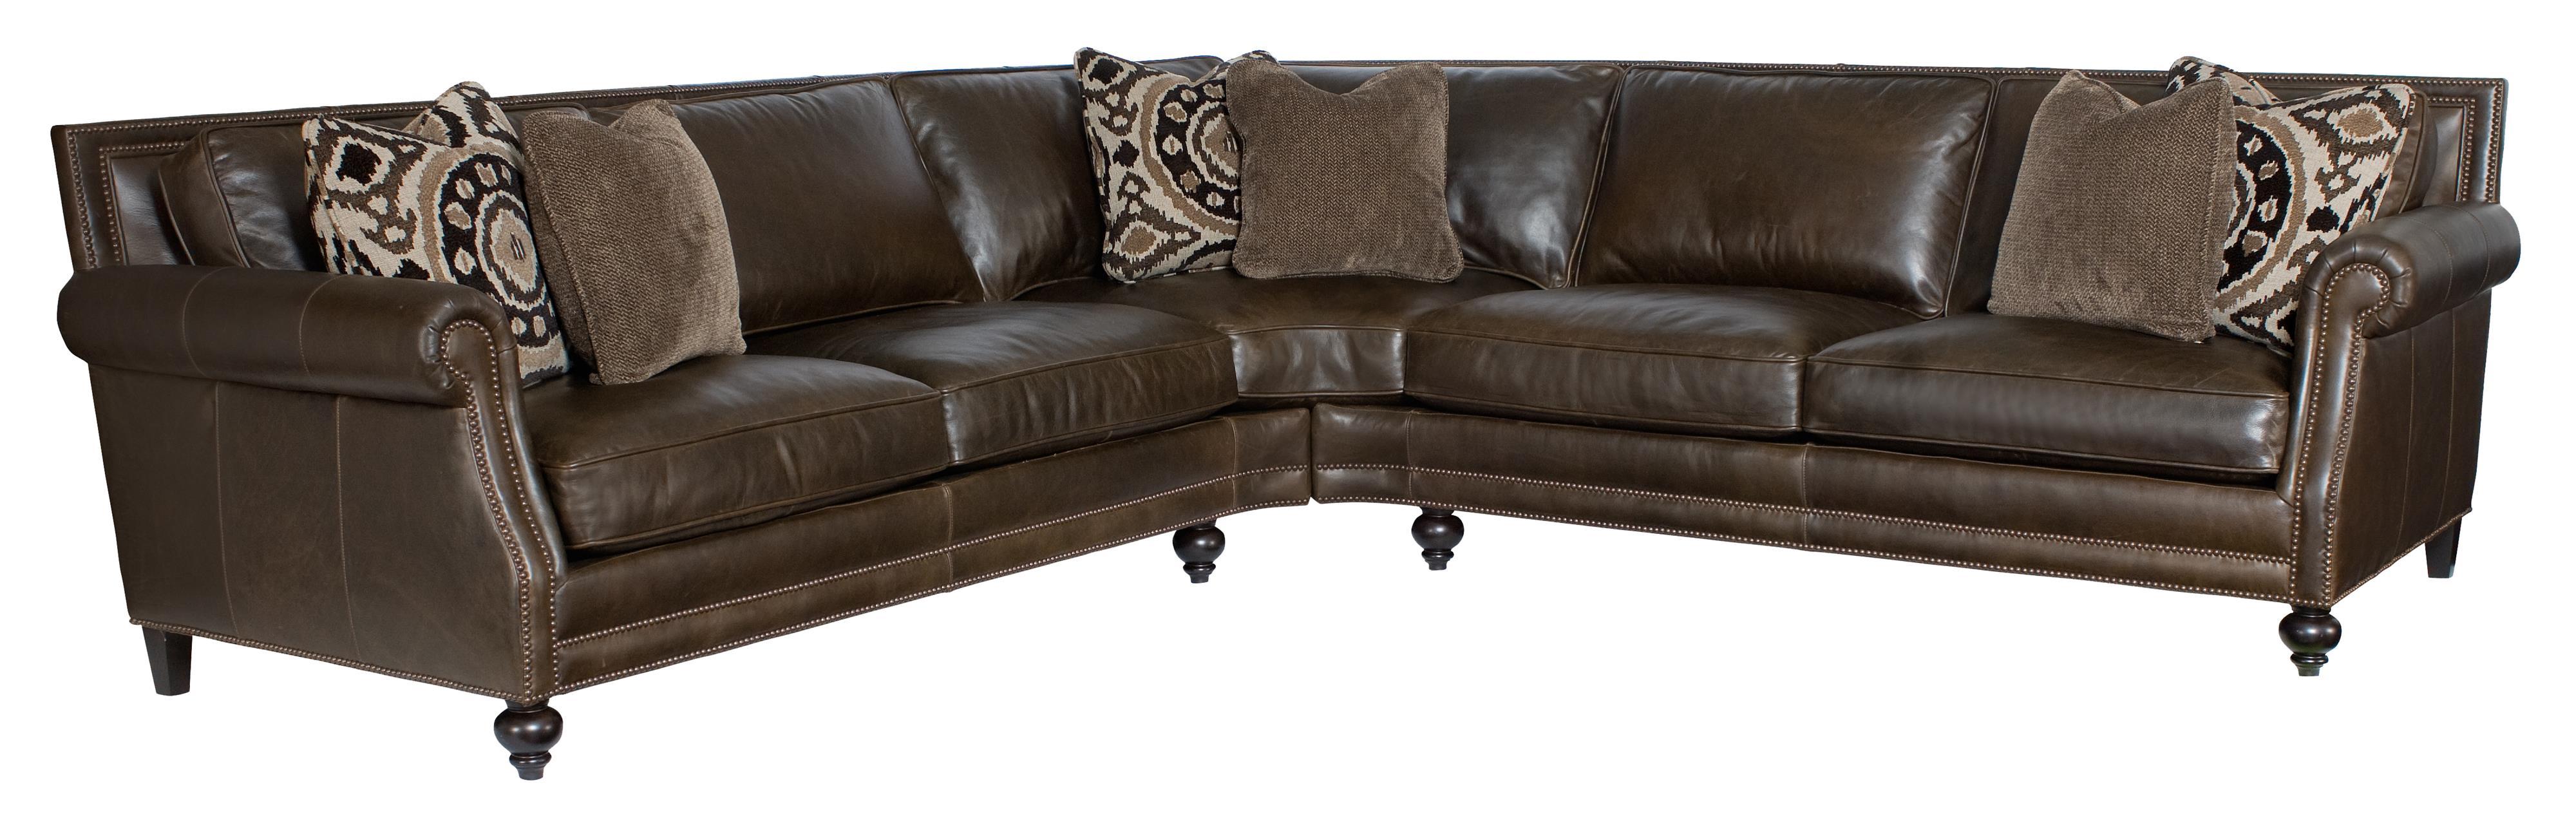 Bernhardt Brae  Sectional Sofa - Item Number: 6892L+6891L-Walnut